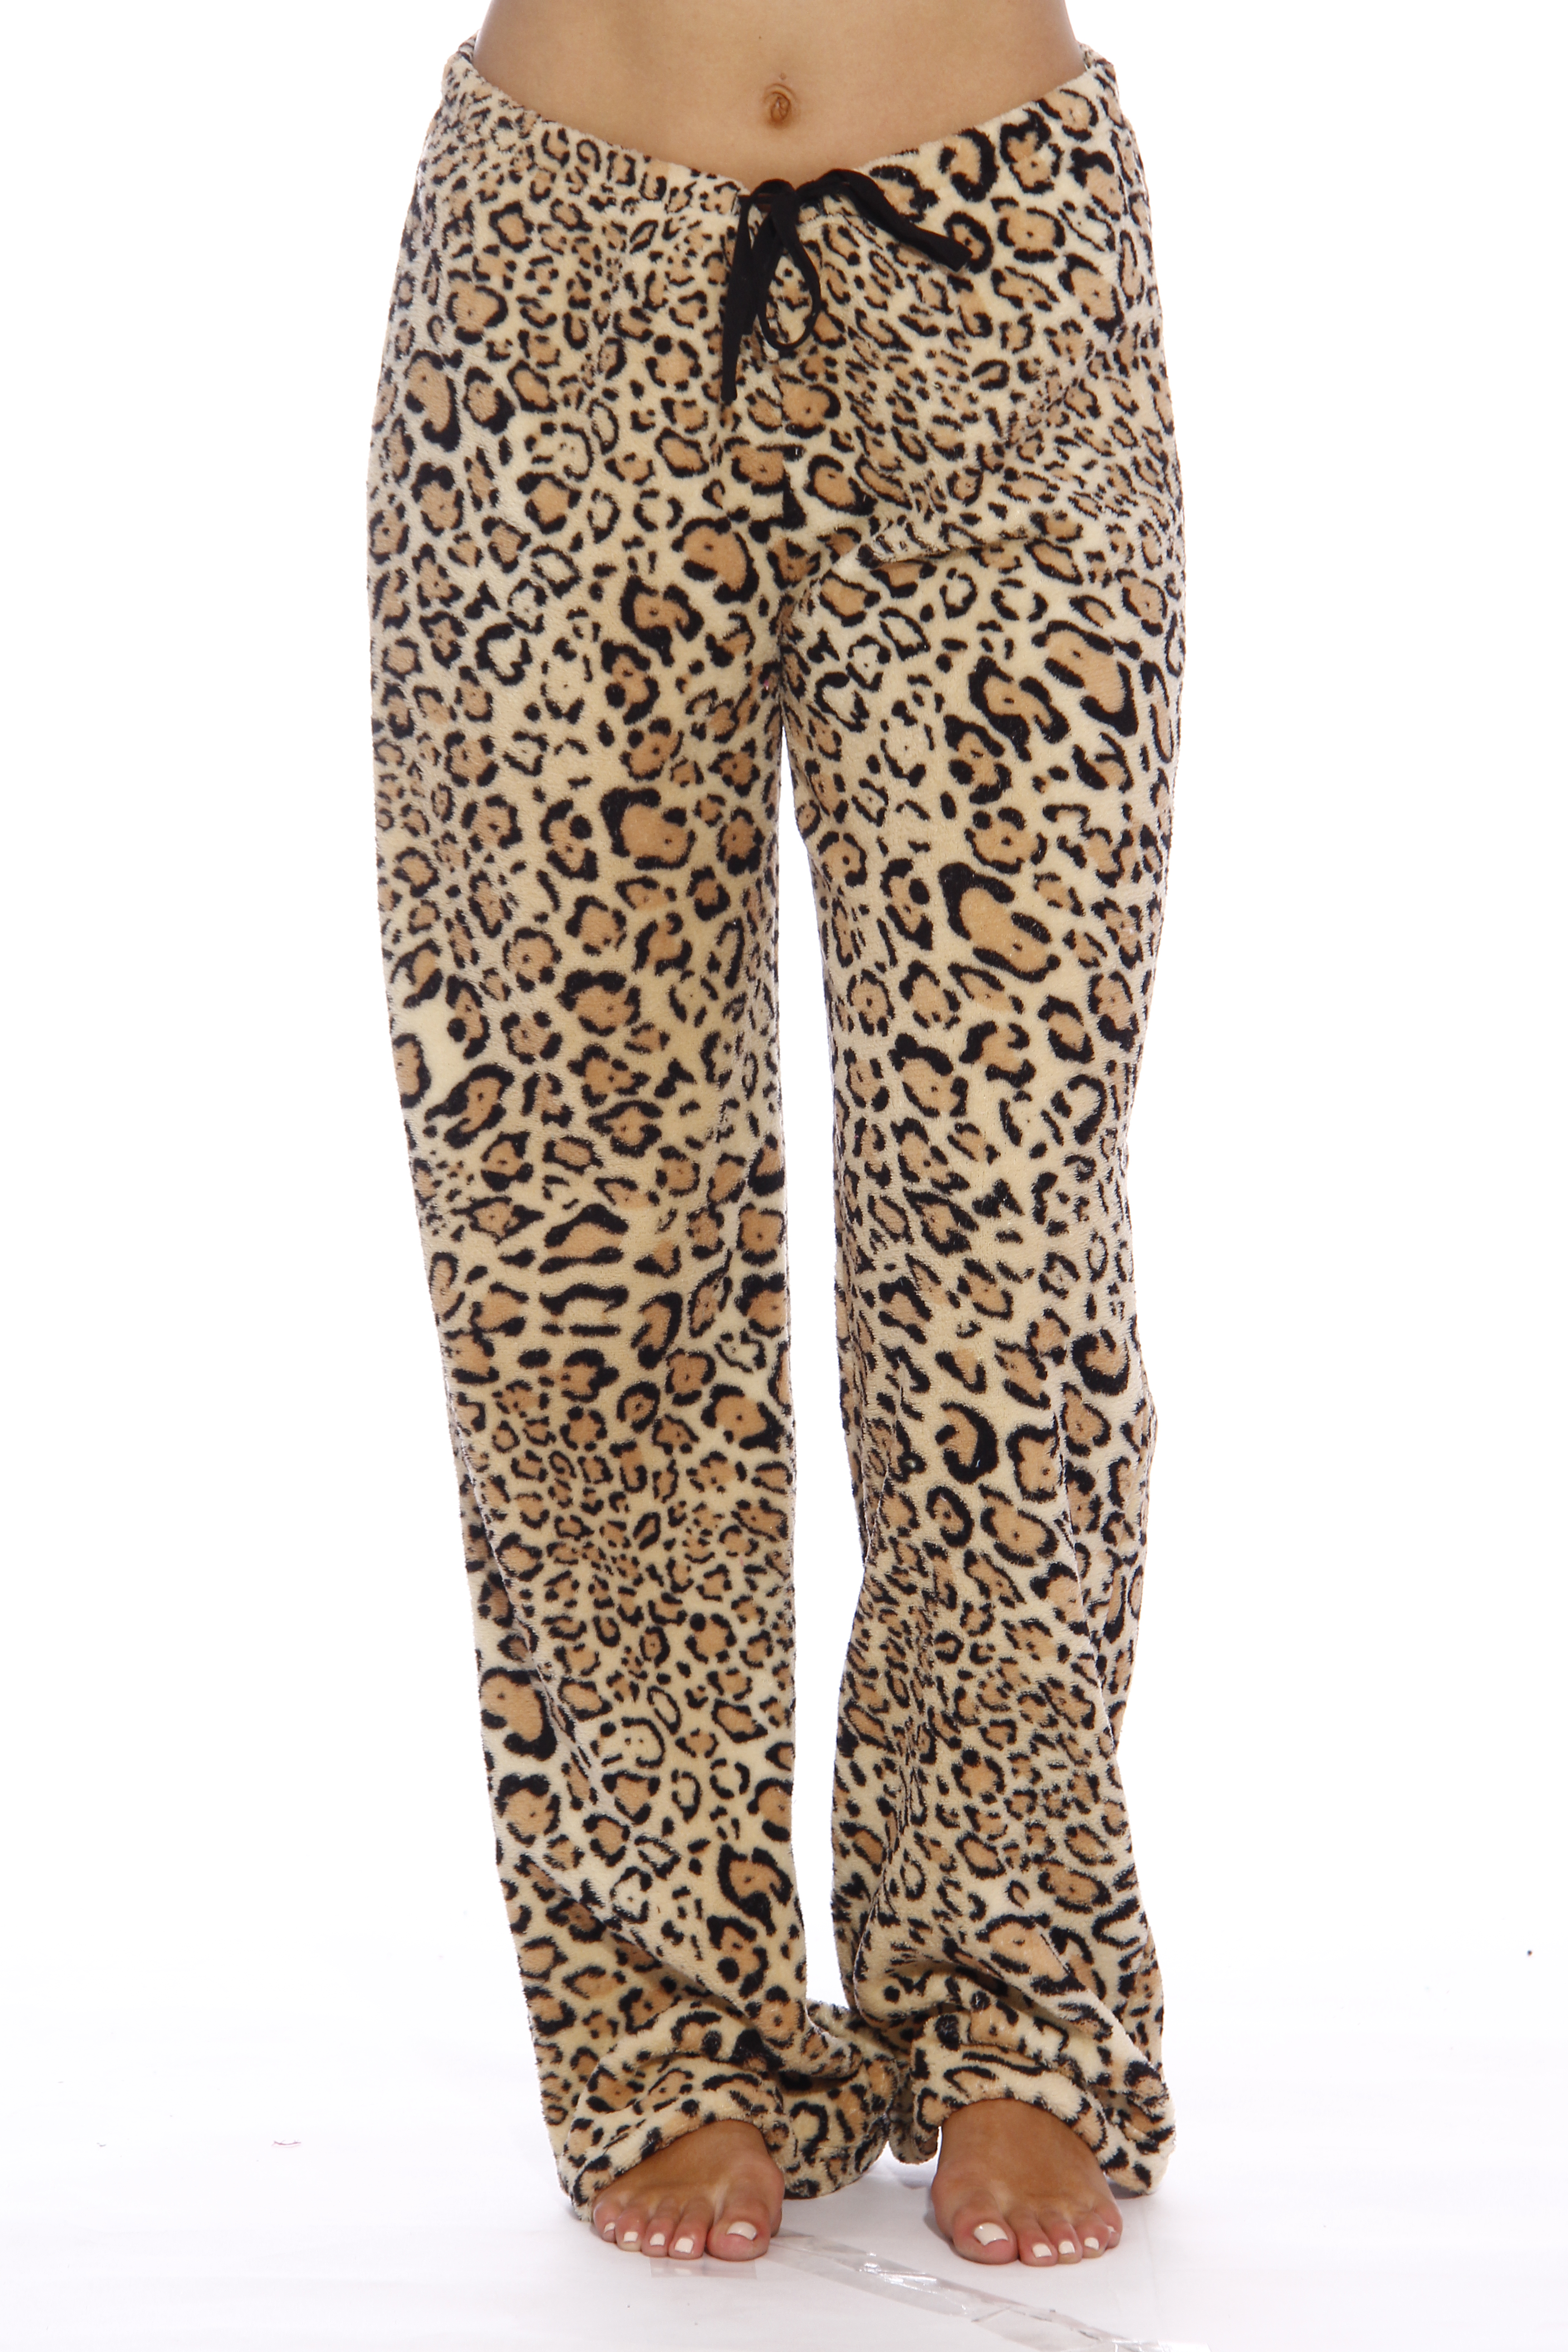 plus size pajamas walmart - Siteze